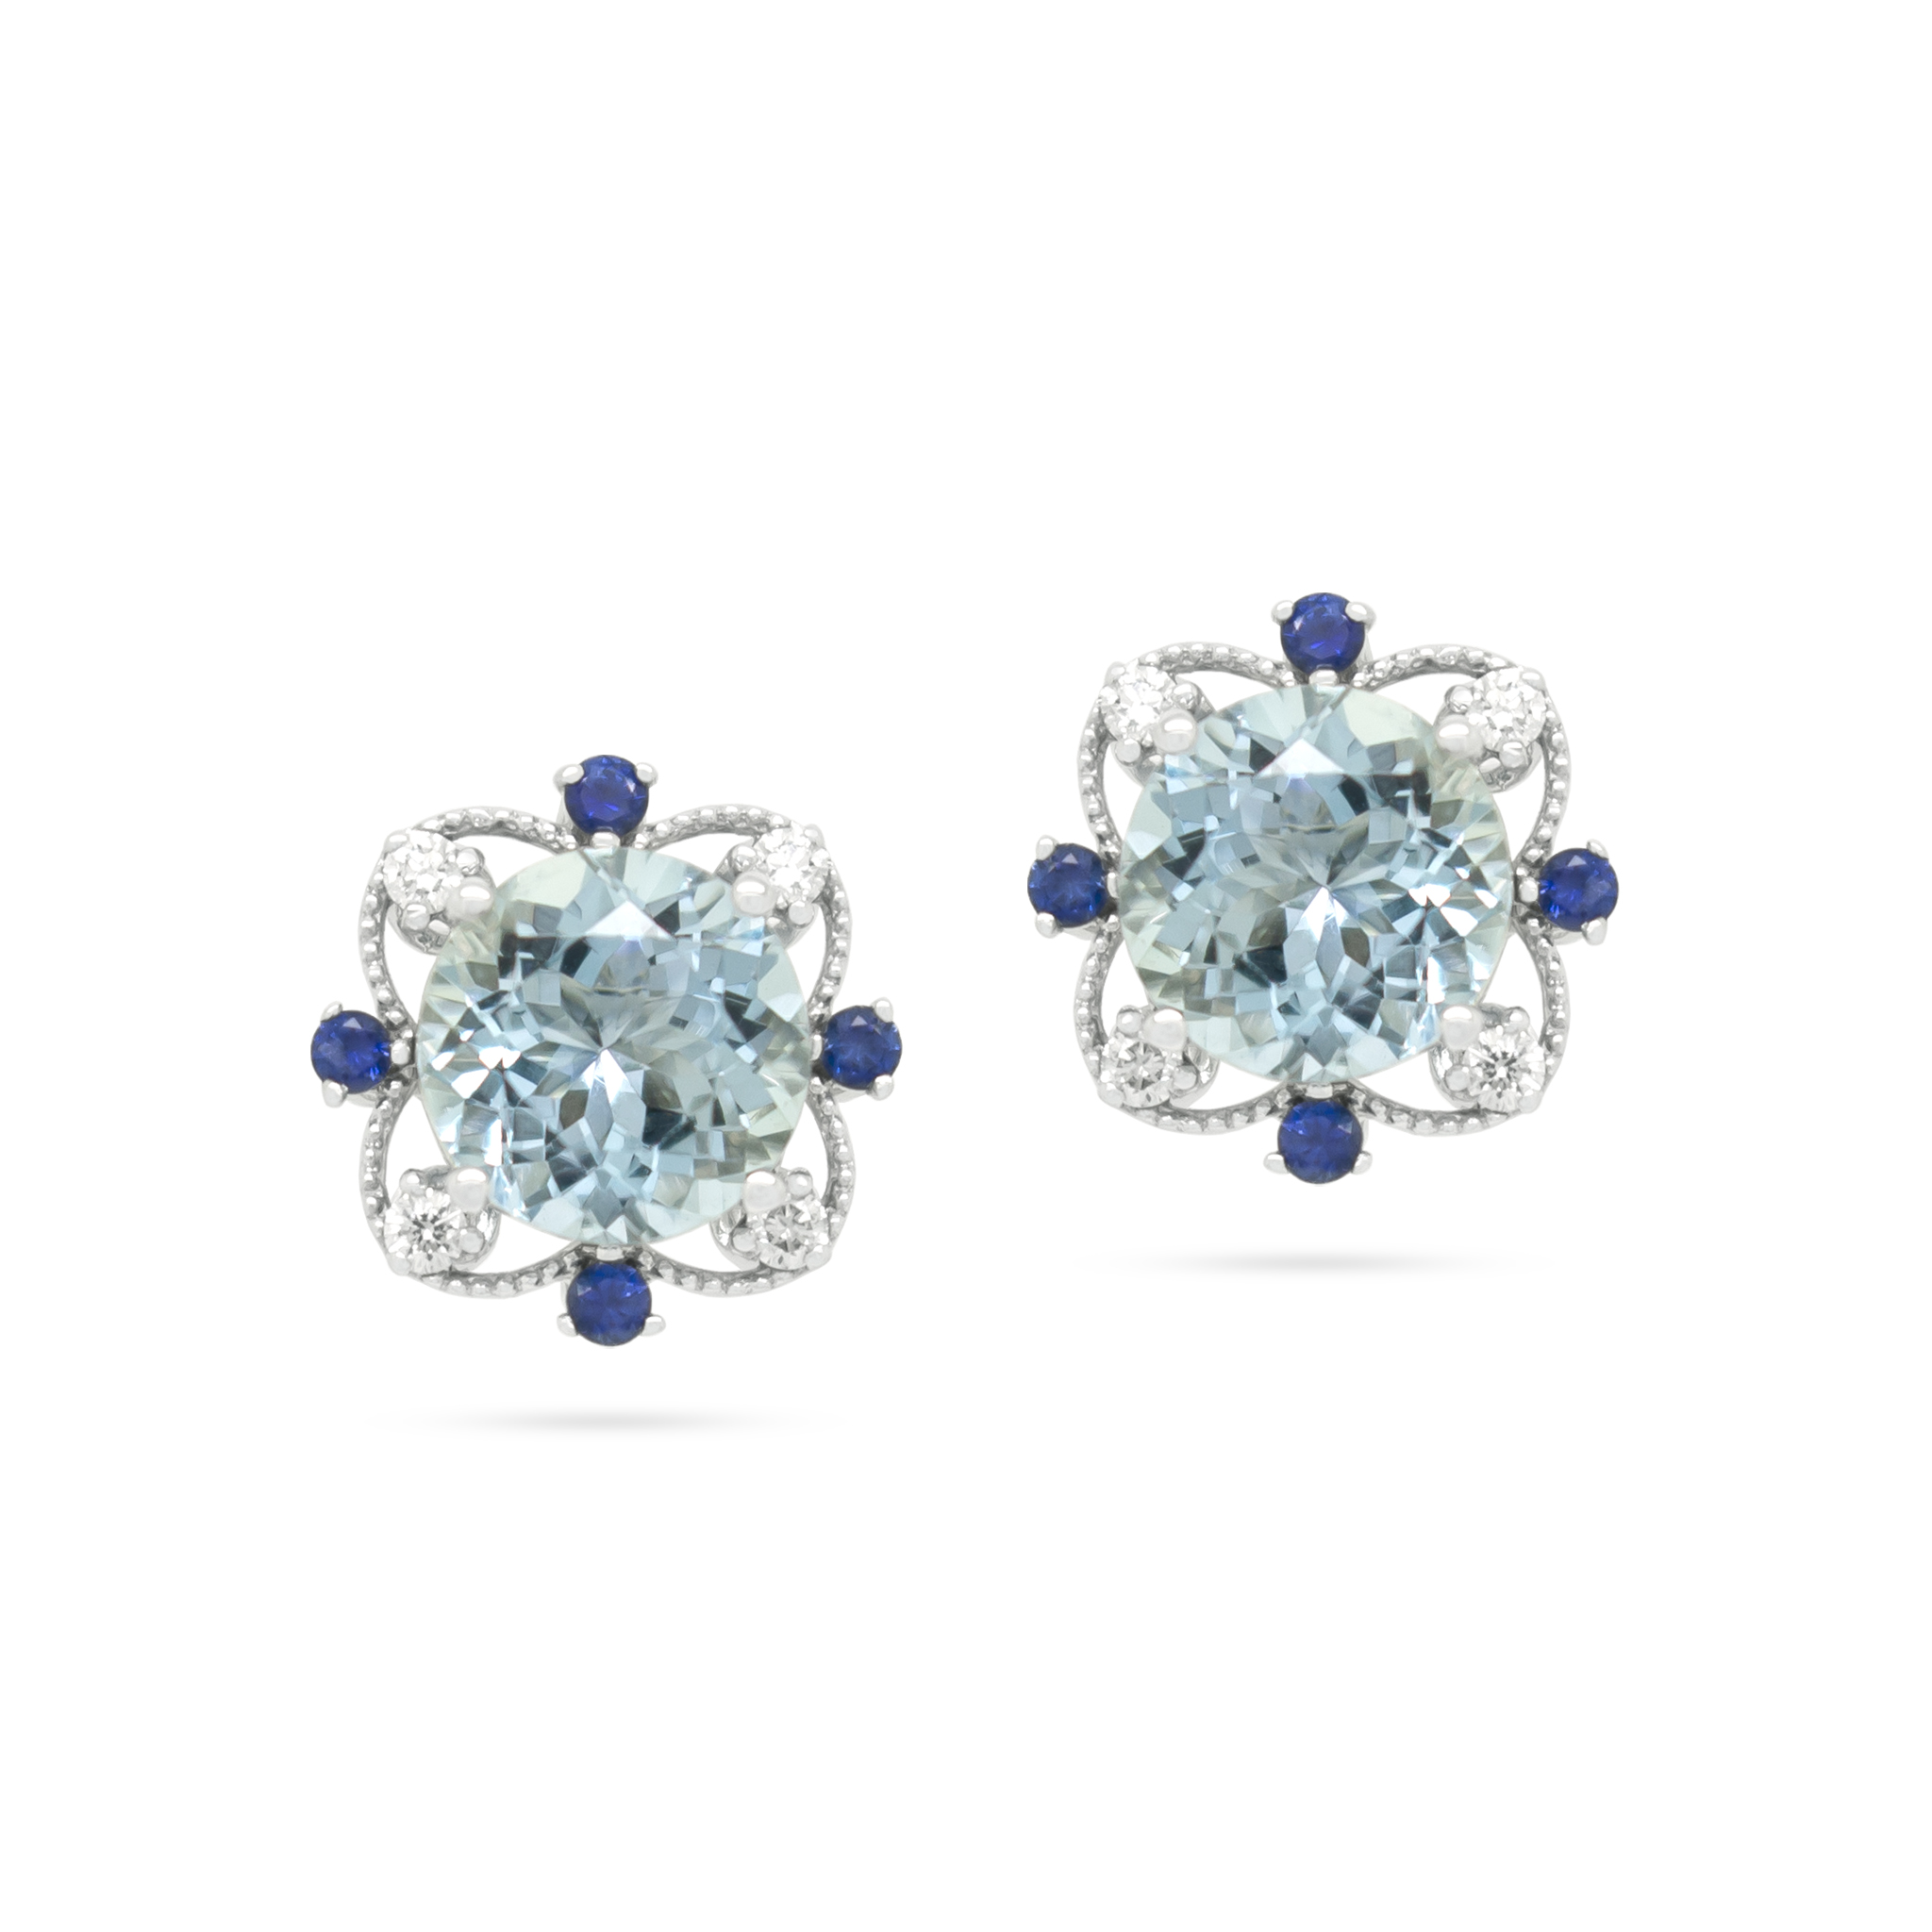 Aquamarine and Sapphire Earstuds